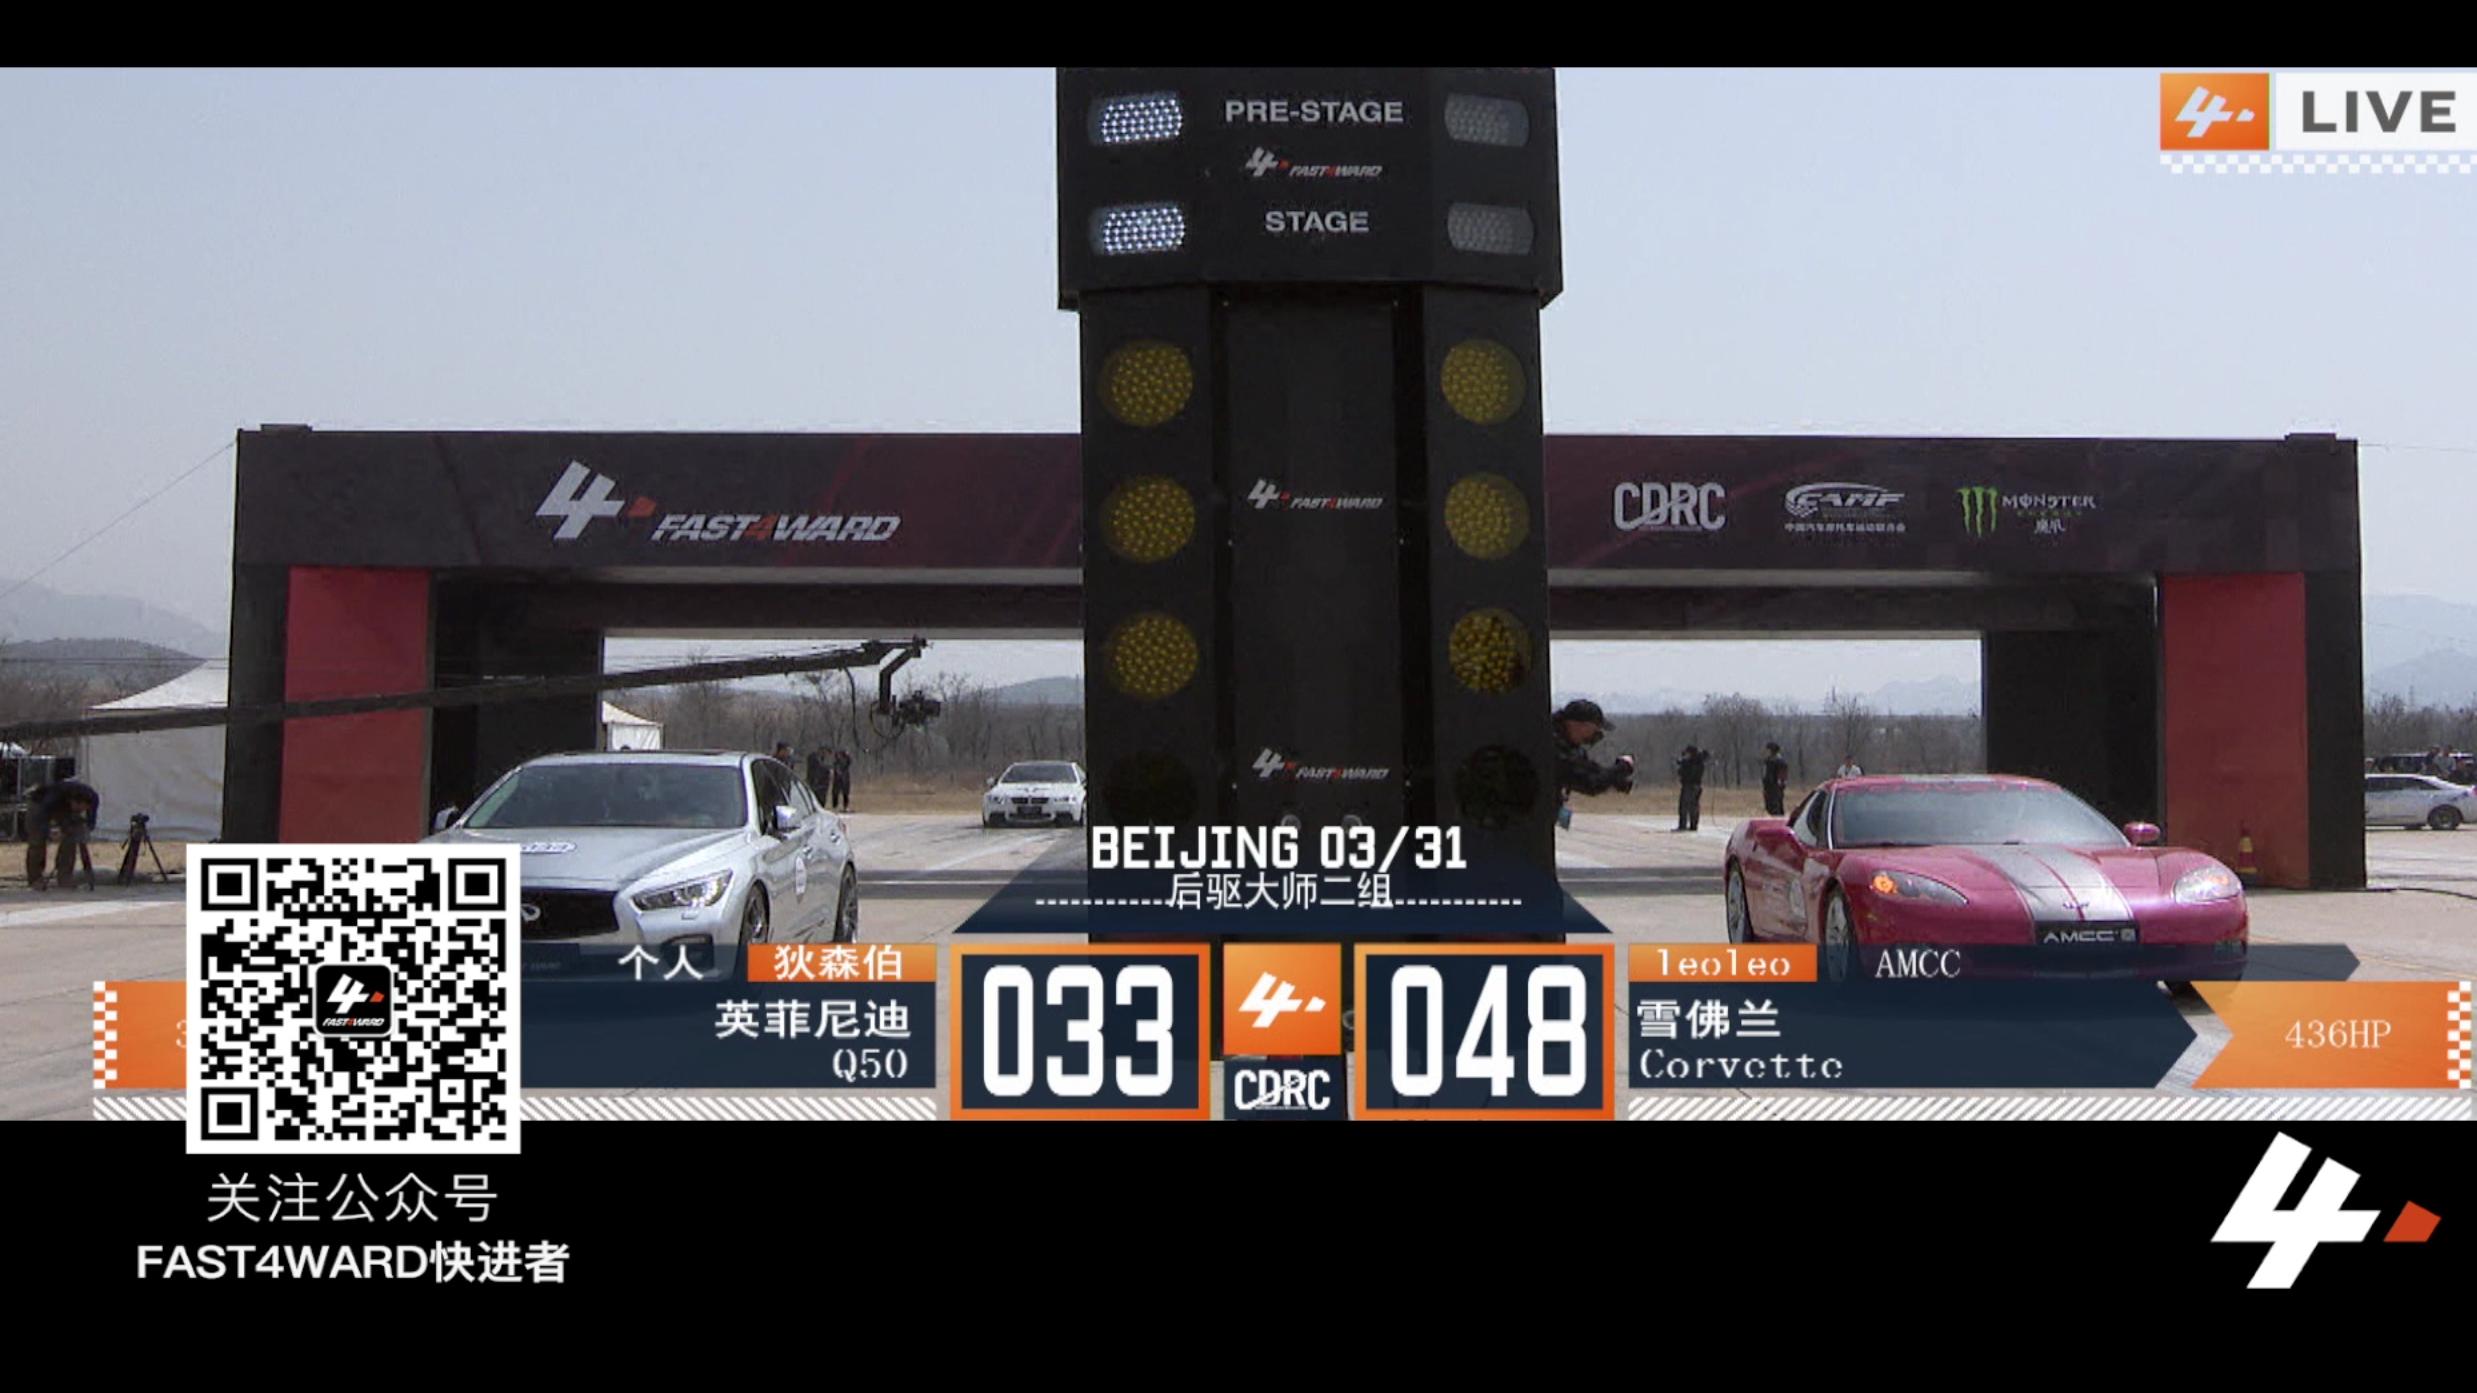 FAET4WARD  北京站 英菲尼迪q50 VS 雪弗兰corvette